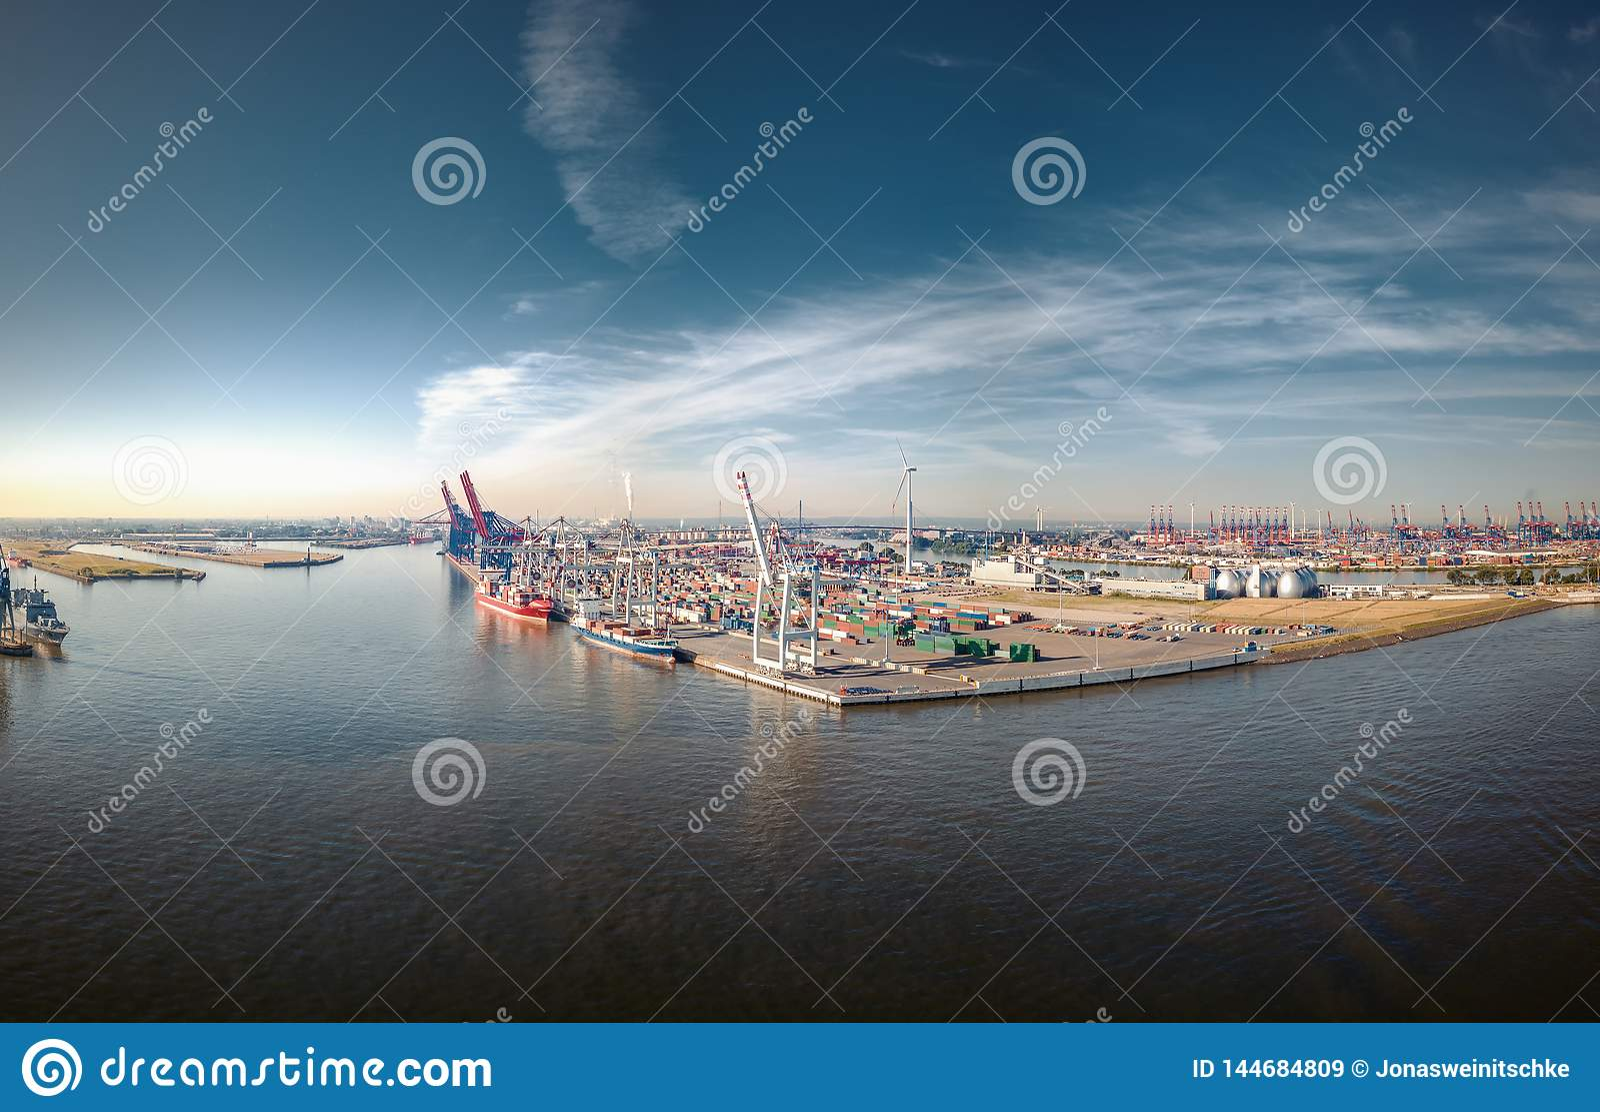 Aerialview en puerto de Hamburgo